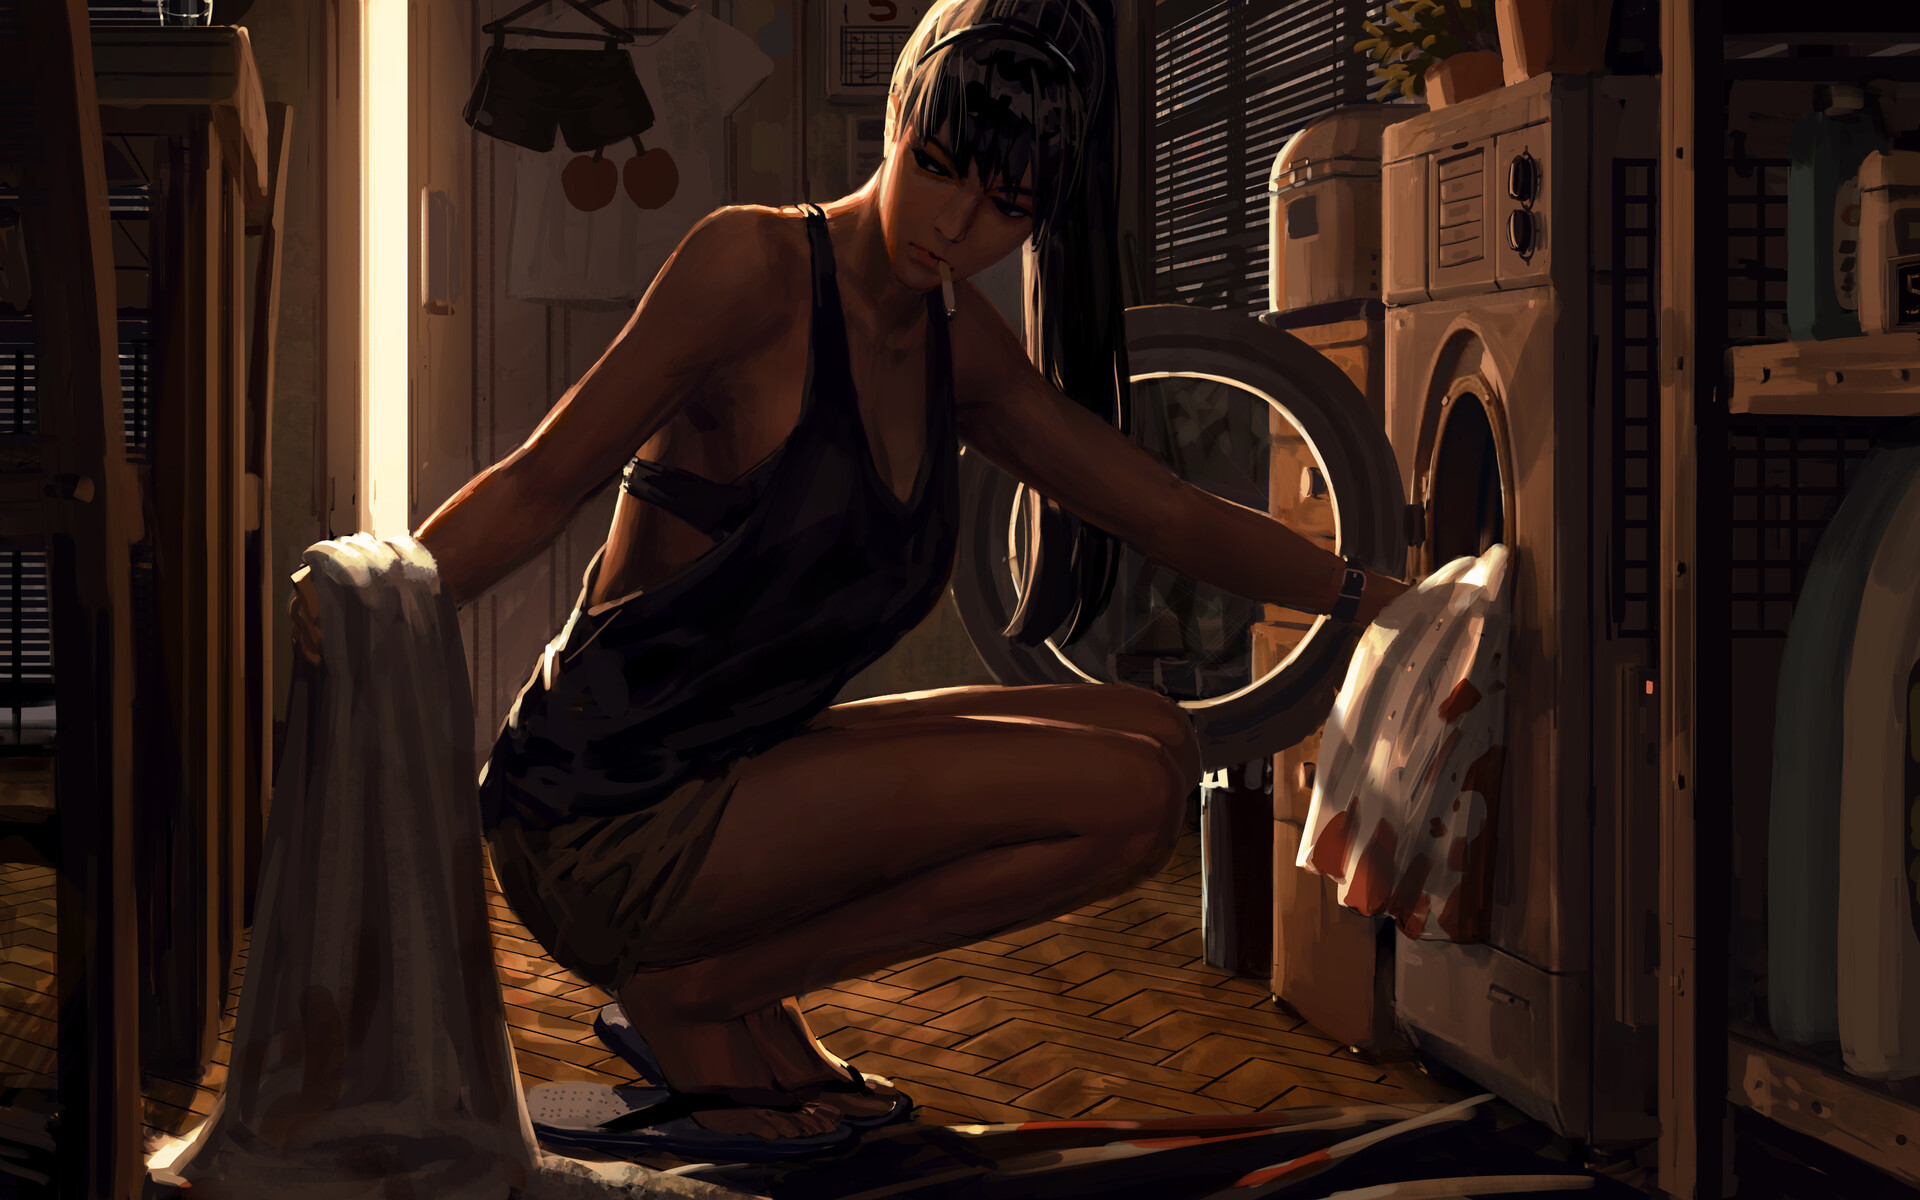 General 1920x1200 laundry women washing machine artwork ArtStation smoking cigarettes GUWEIZ black bras thighs blood long hair black hair ponytail cleavage 2D squatting